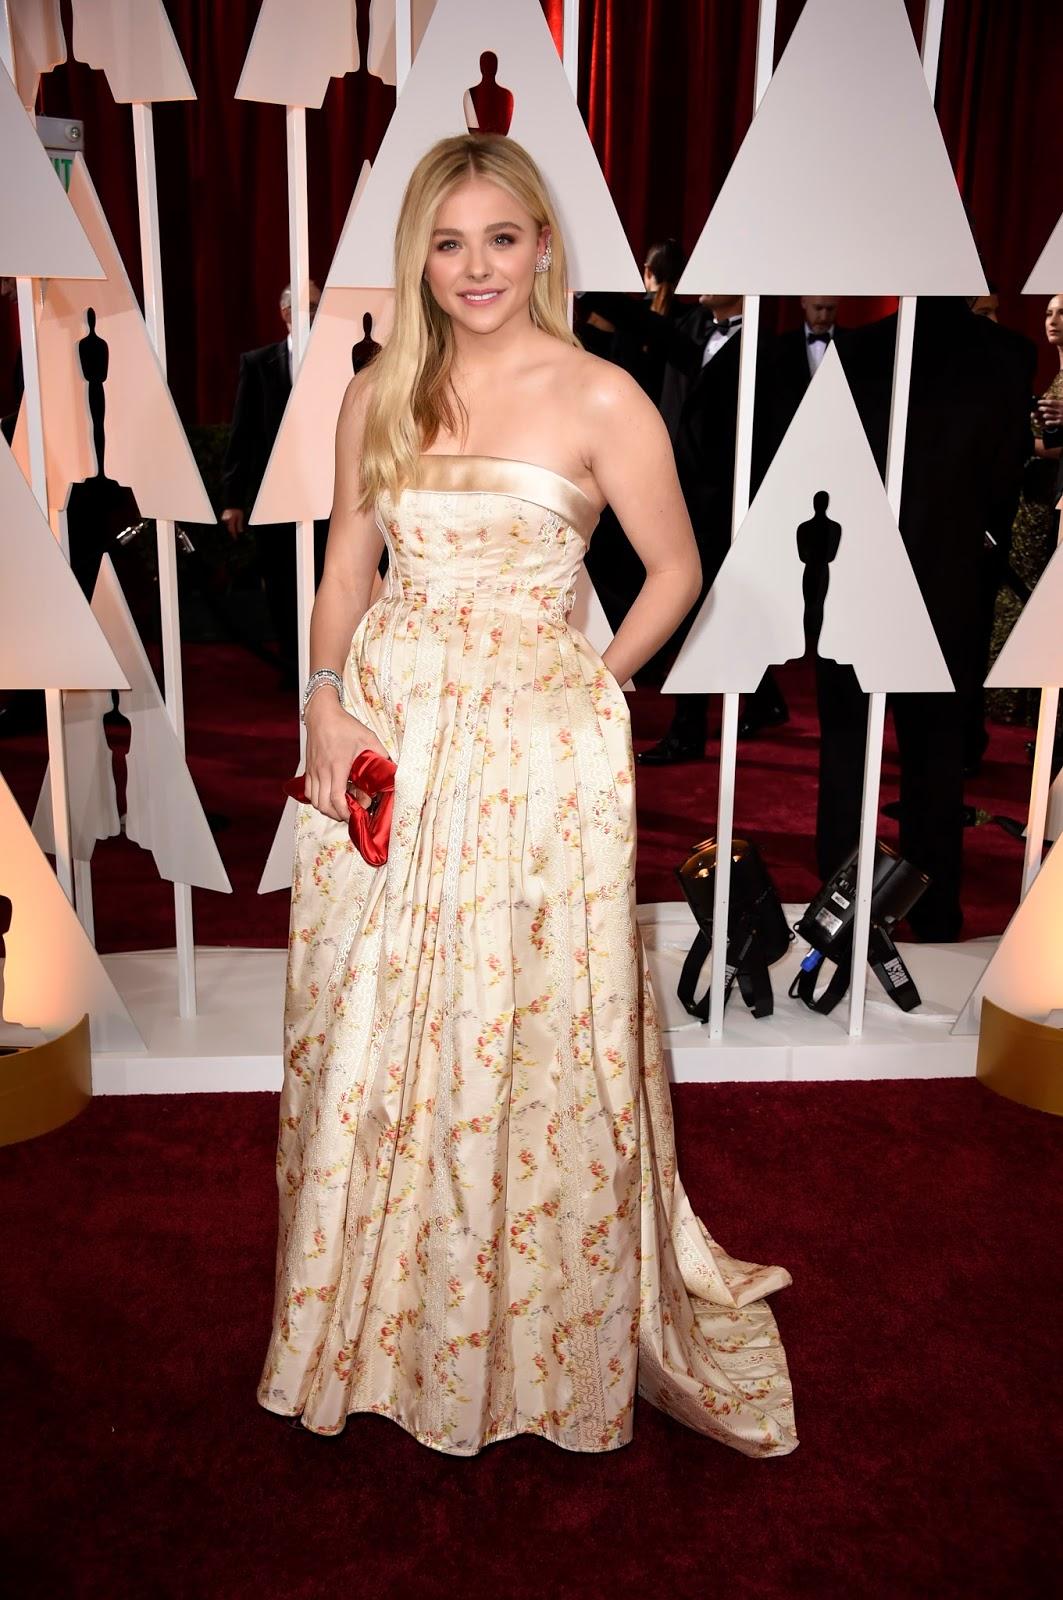 Chloe Grace Moretz Academy Awards 2015 Oscars